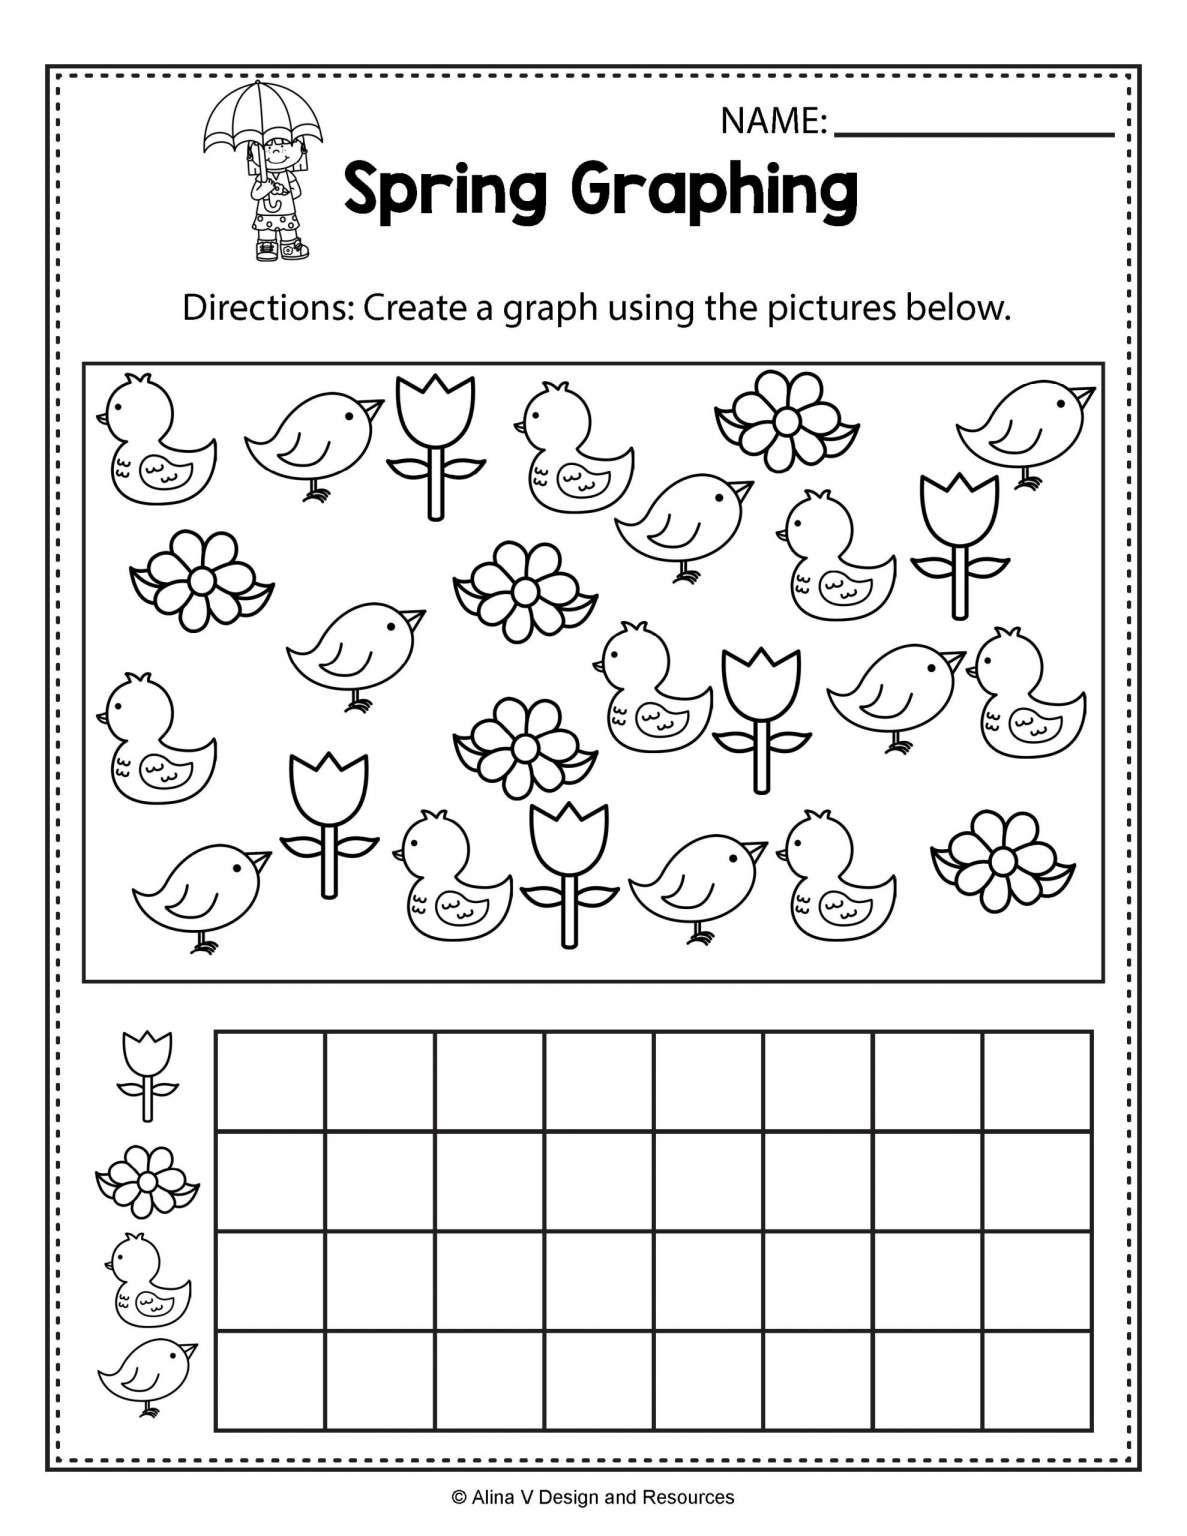 10 Spring Worksheets For 3rd Grade In